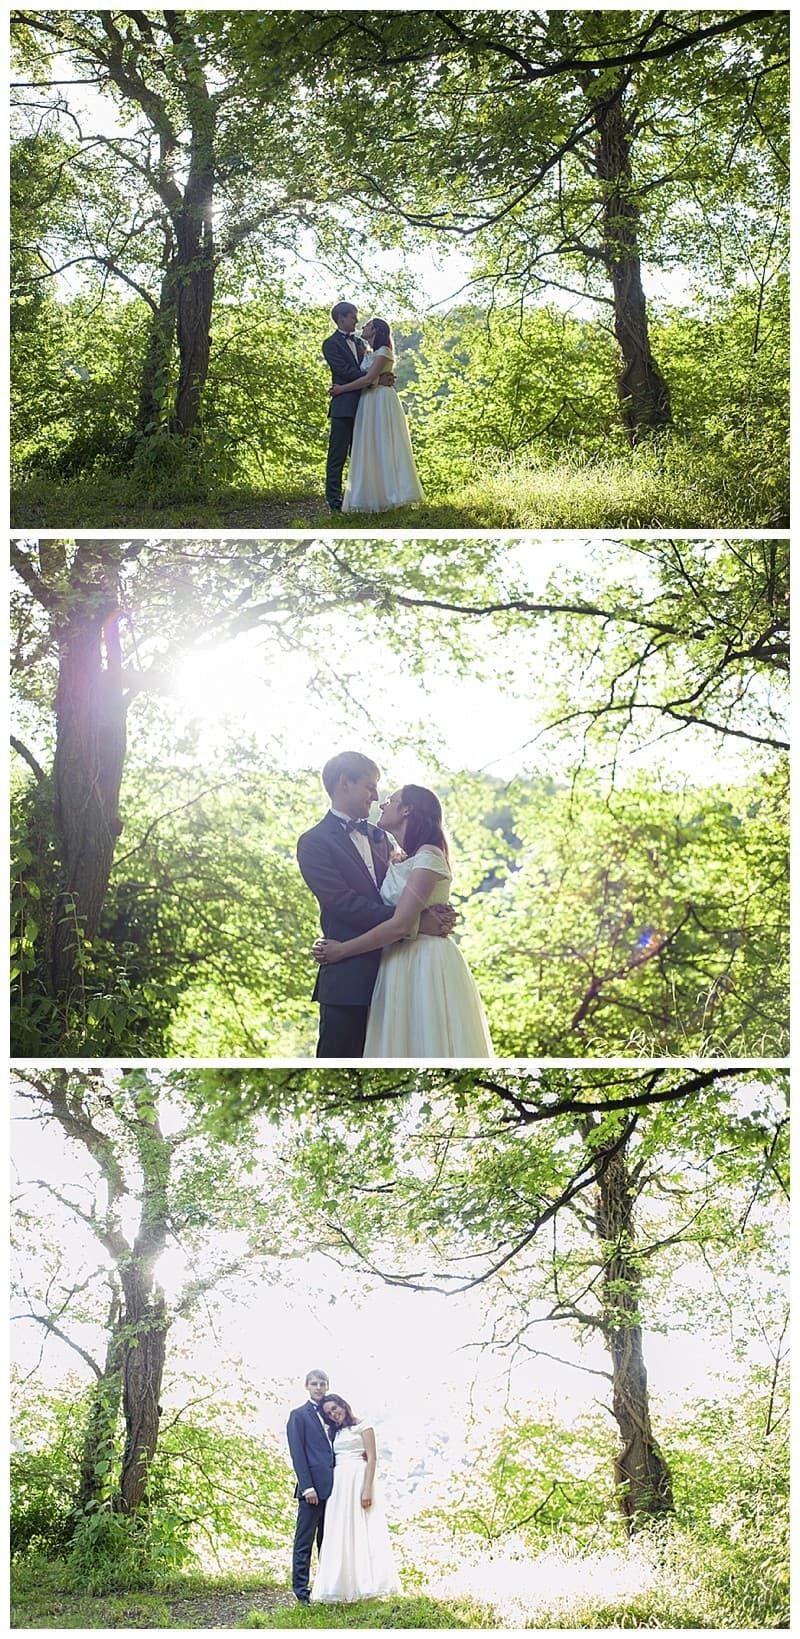 Richard & Elizabeth Scouting Wedding, Benjamin Wetherall Photography0029